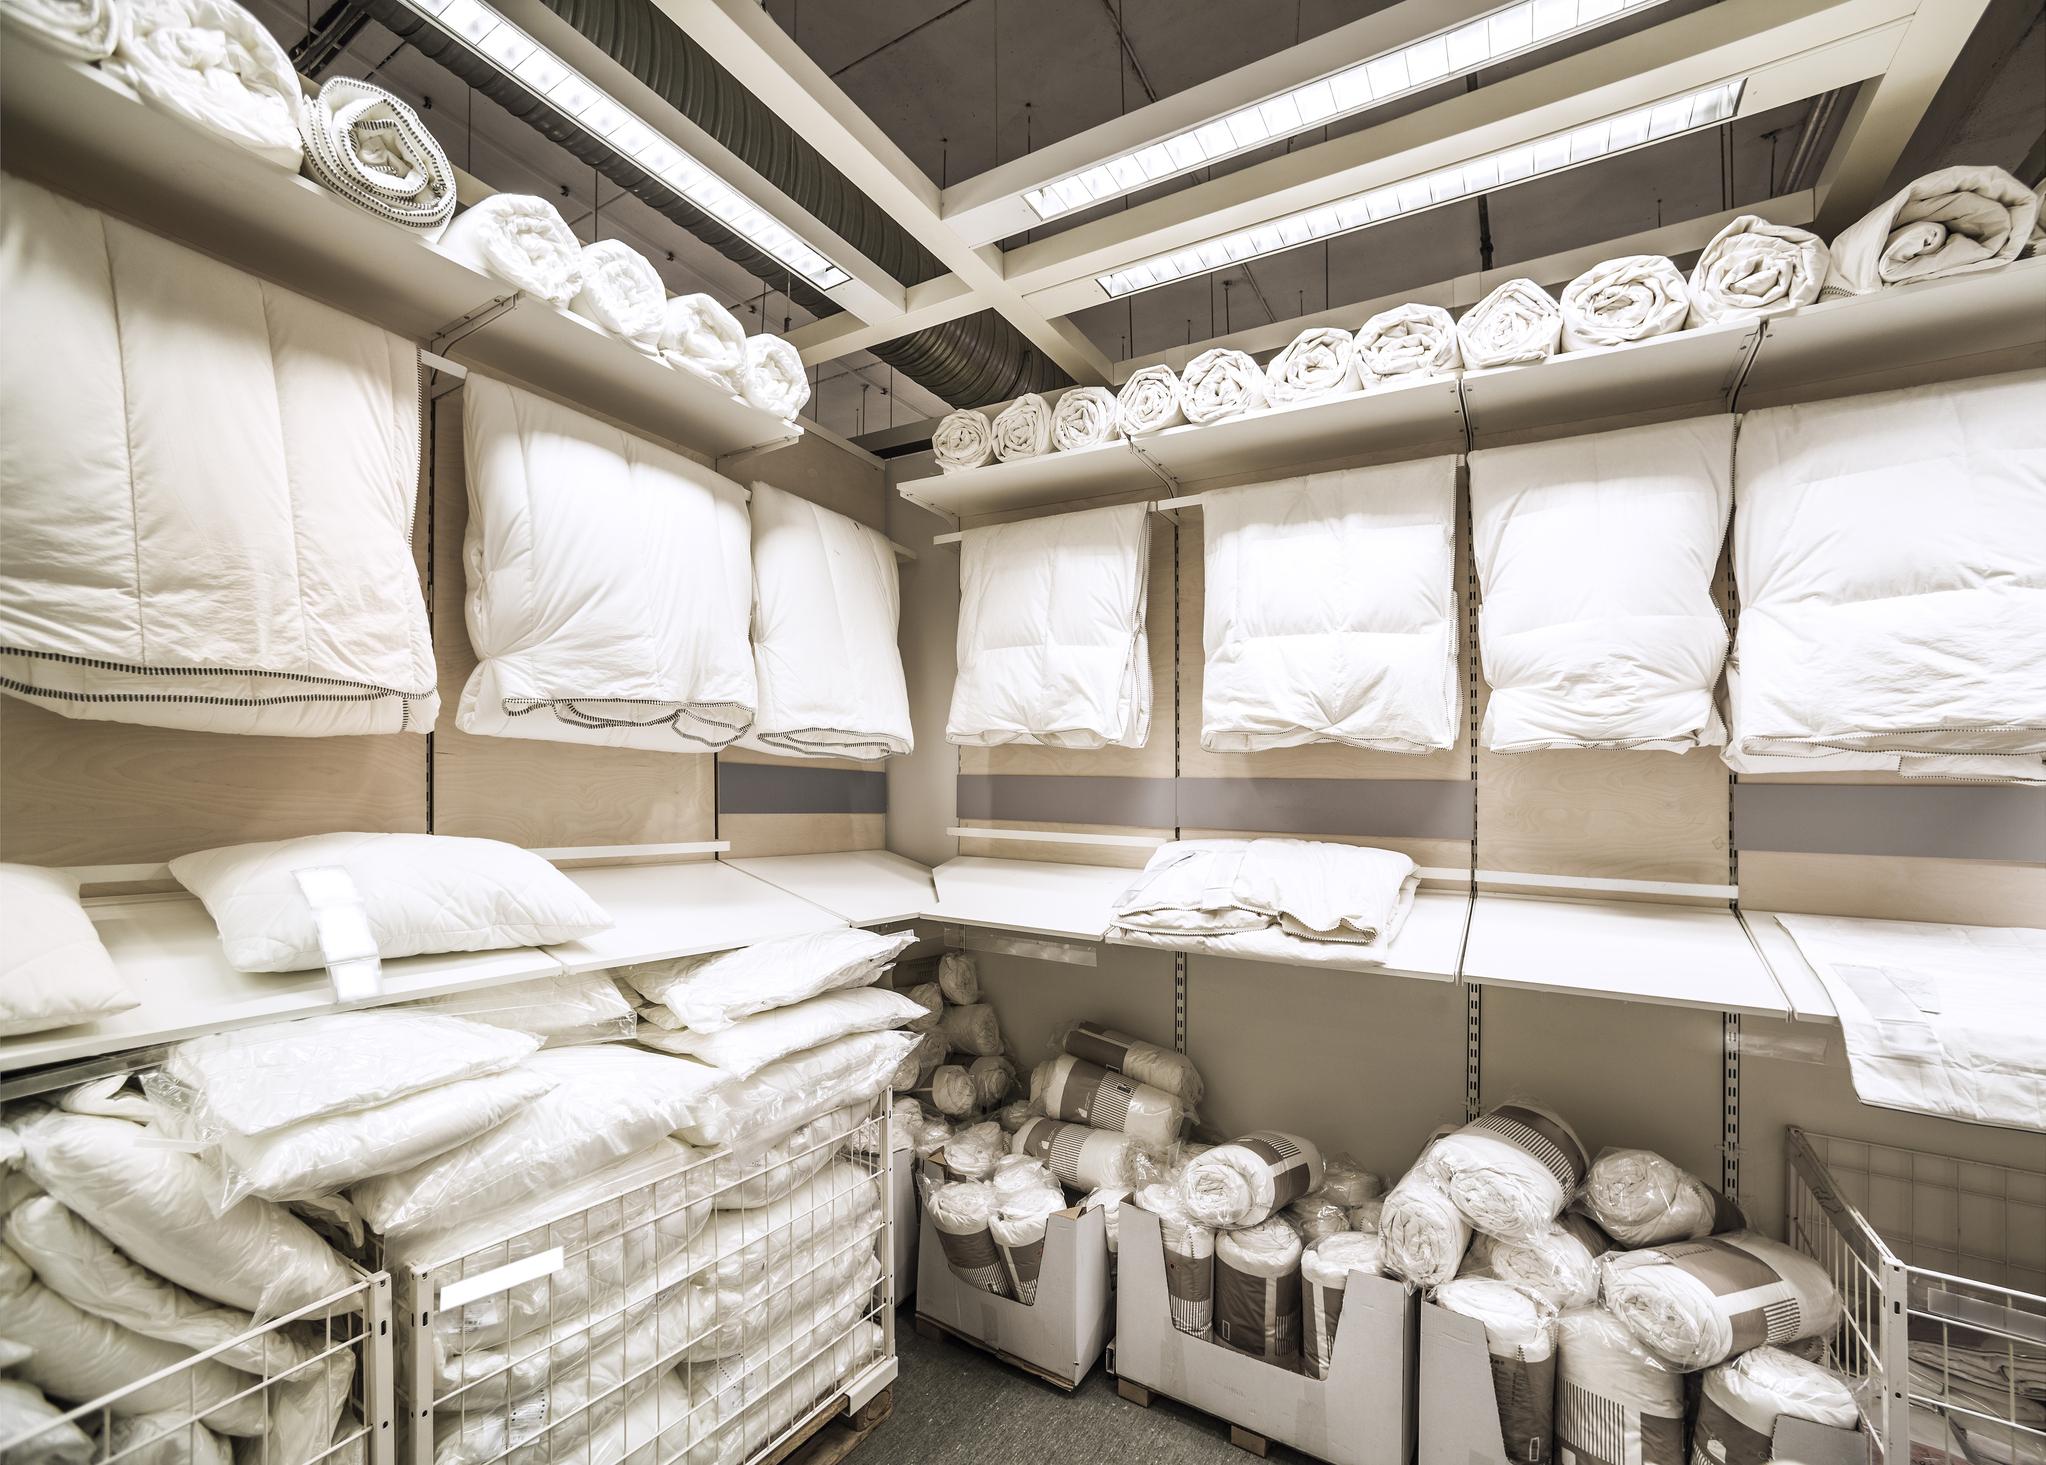 Home furnishings and bedding on display